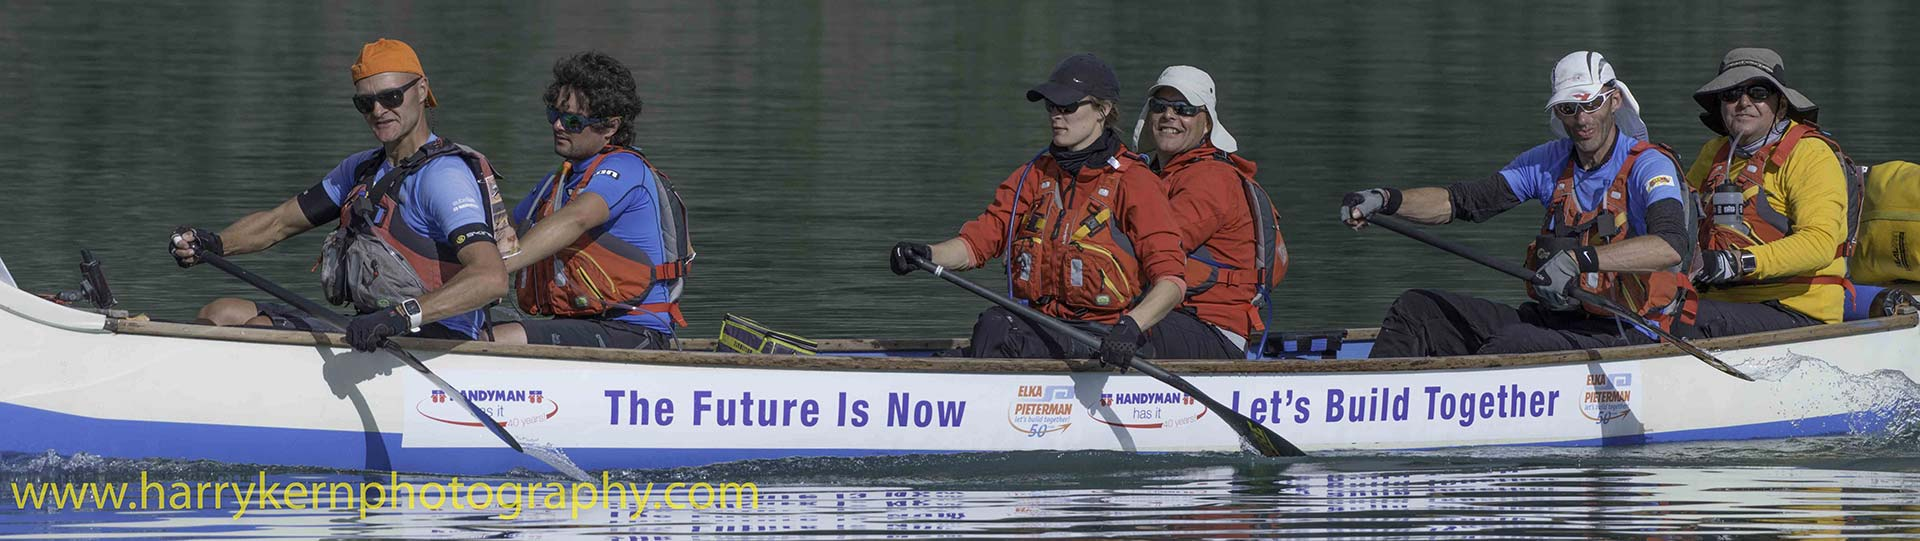 Yukon River Quest – Racing Grade Rentals - Yukon Wide Adventures